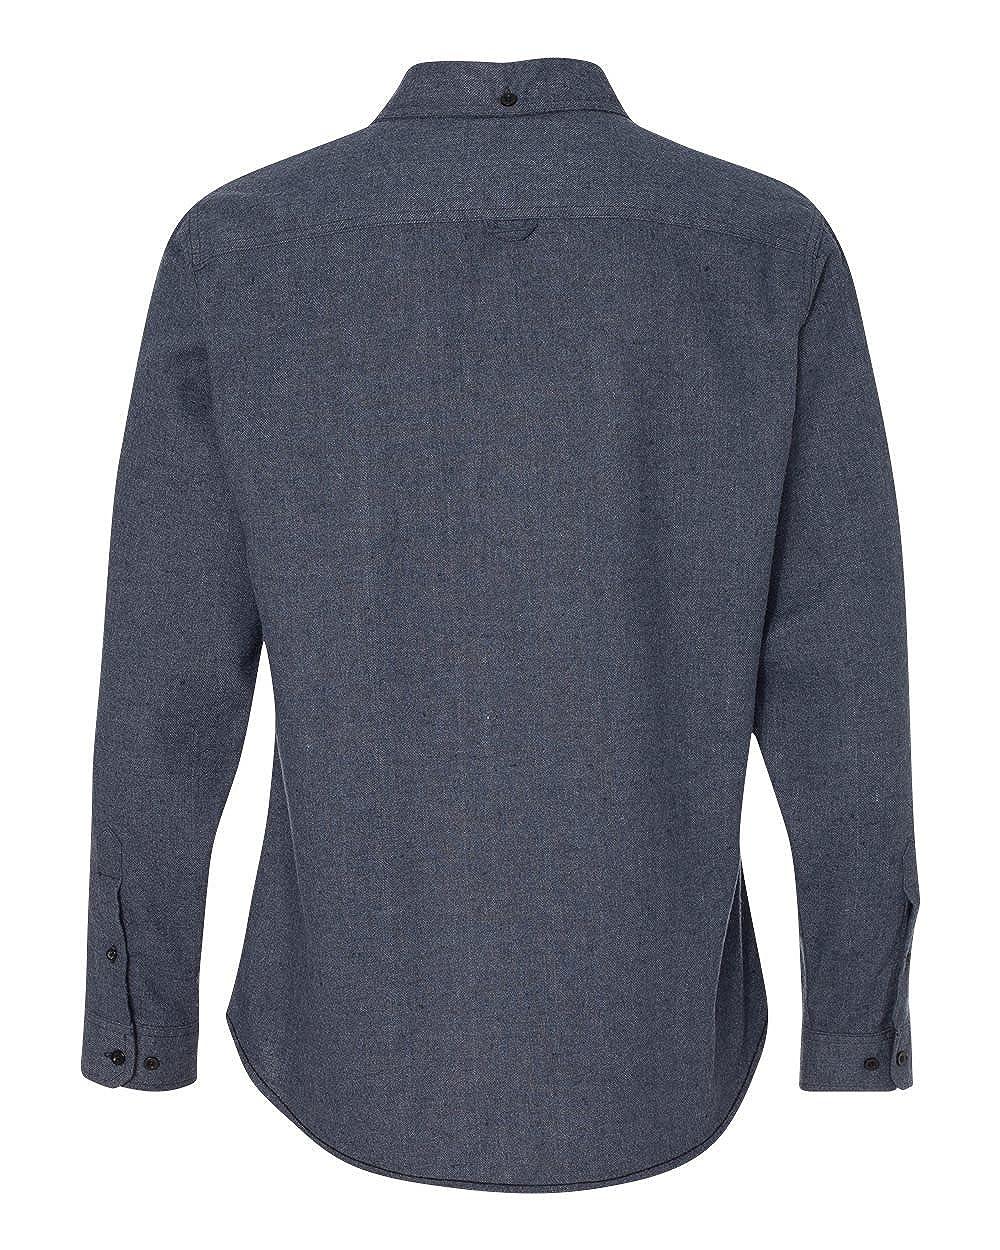 Burnside Mens 8200 Long Sleeve Solid Button-up Flannel Shirt